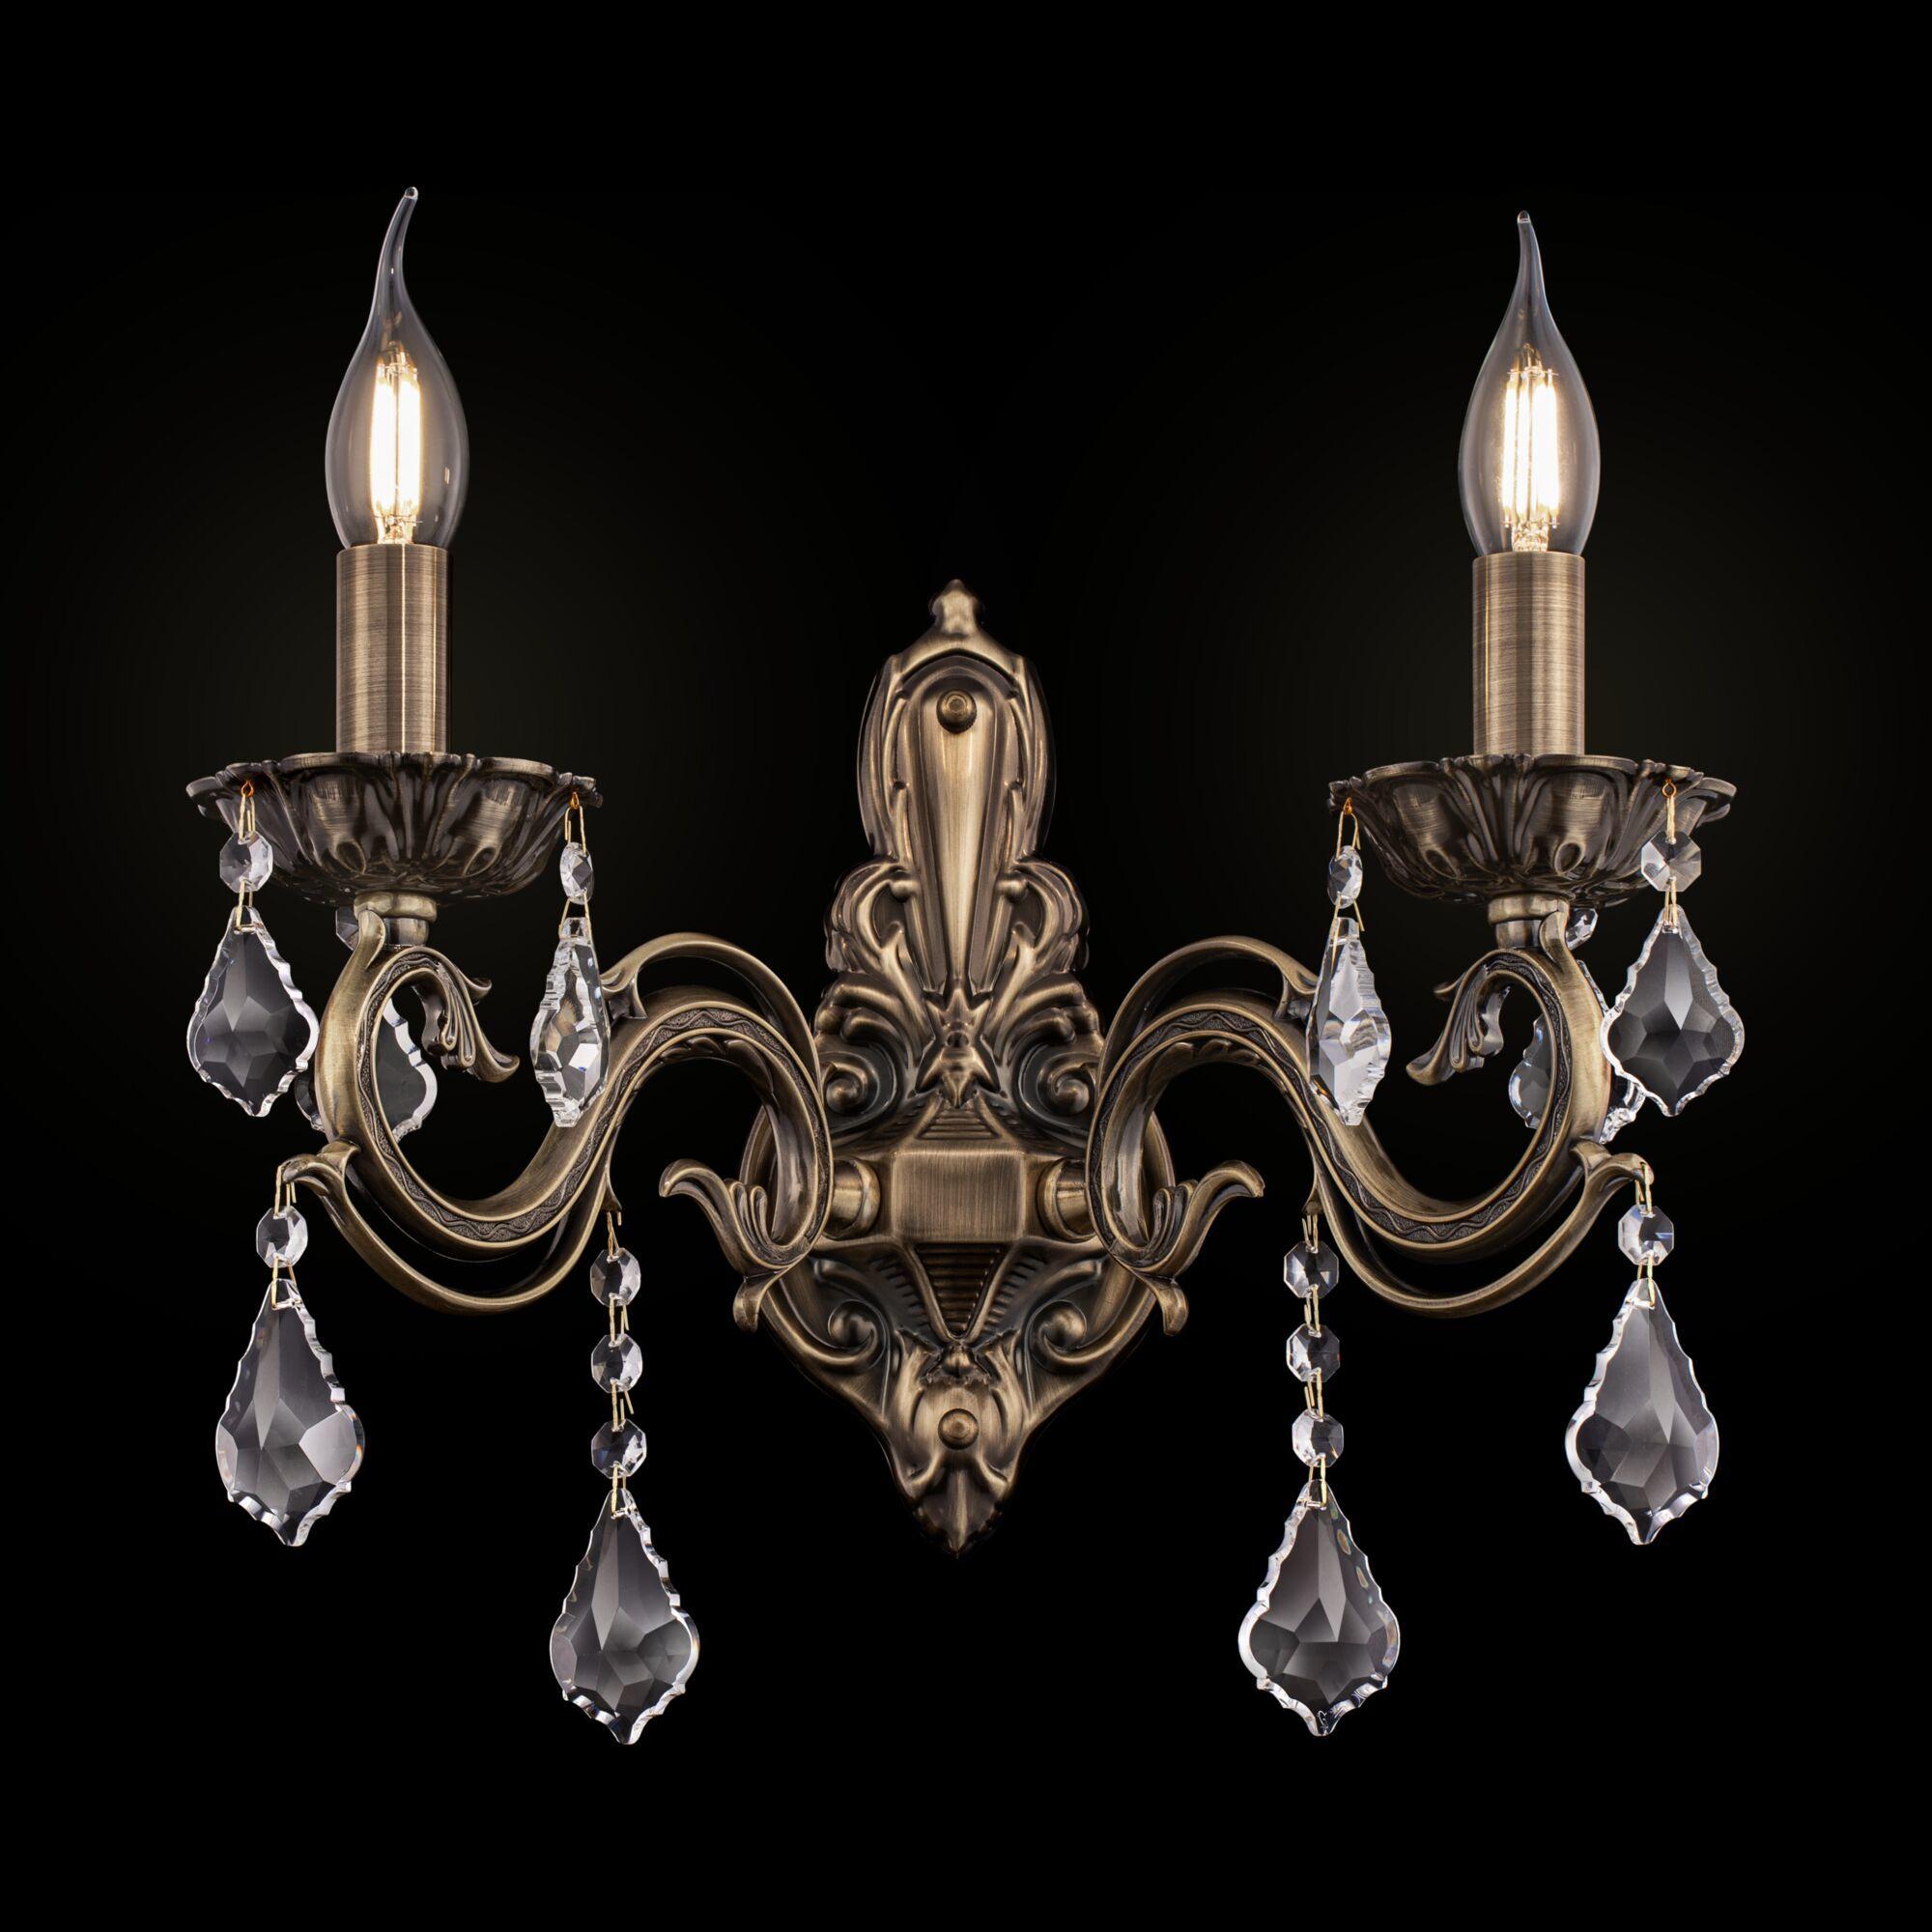 Бра Maytoni Bronze RC245-WL-02-R (arm245-02-r), 2xE14x60W, бронза, прозрачный, металл, стекло - фото 1